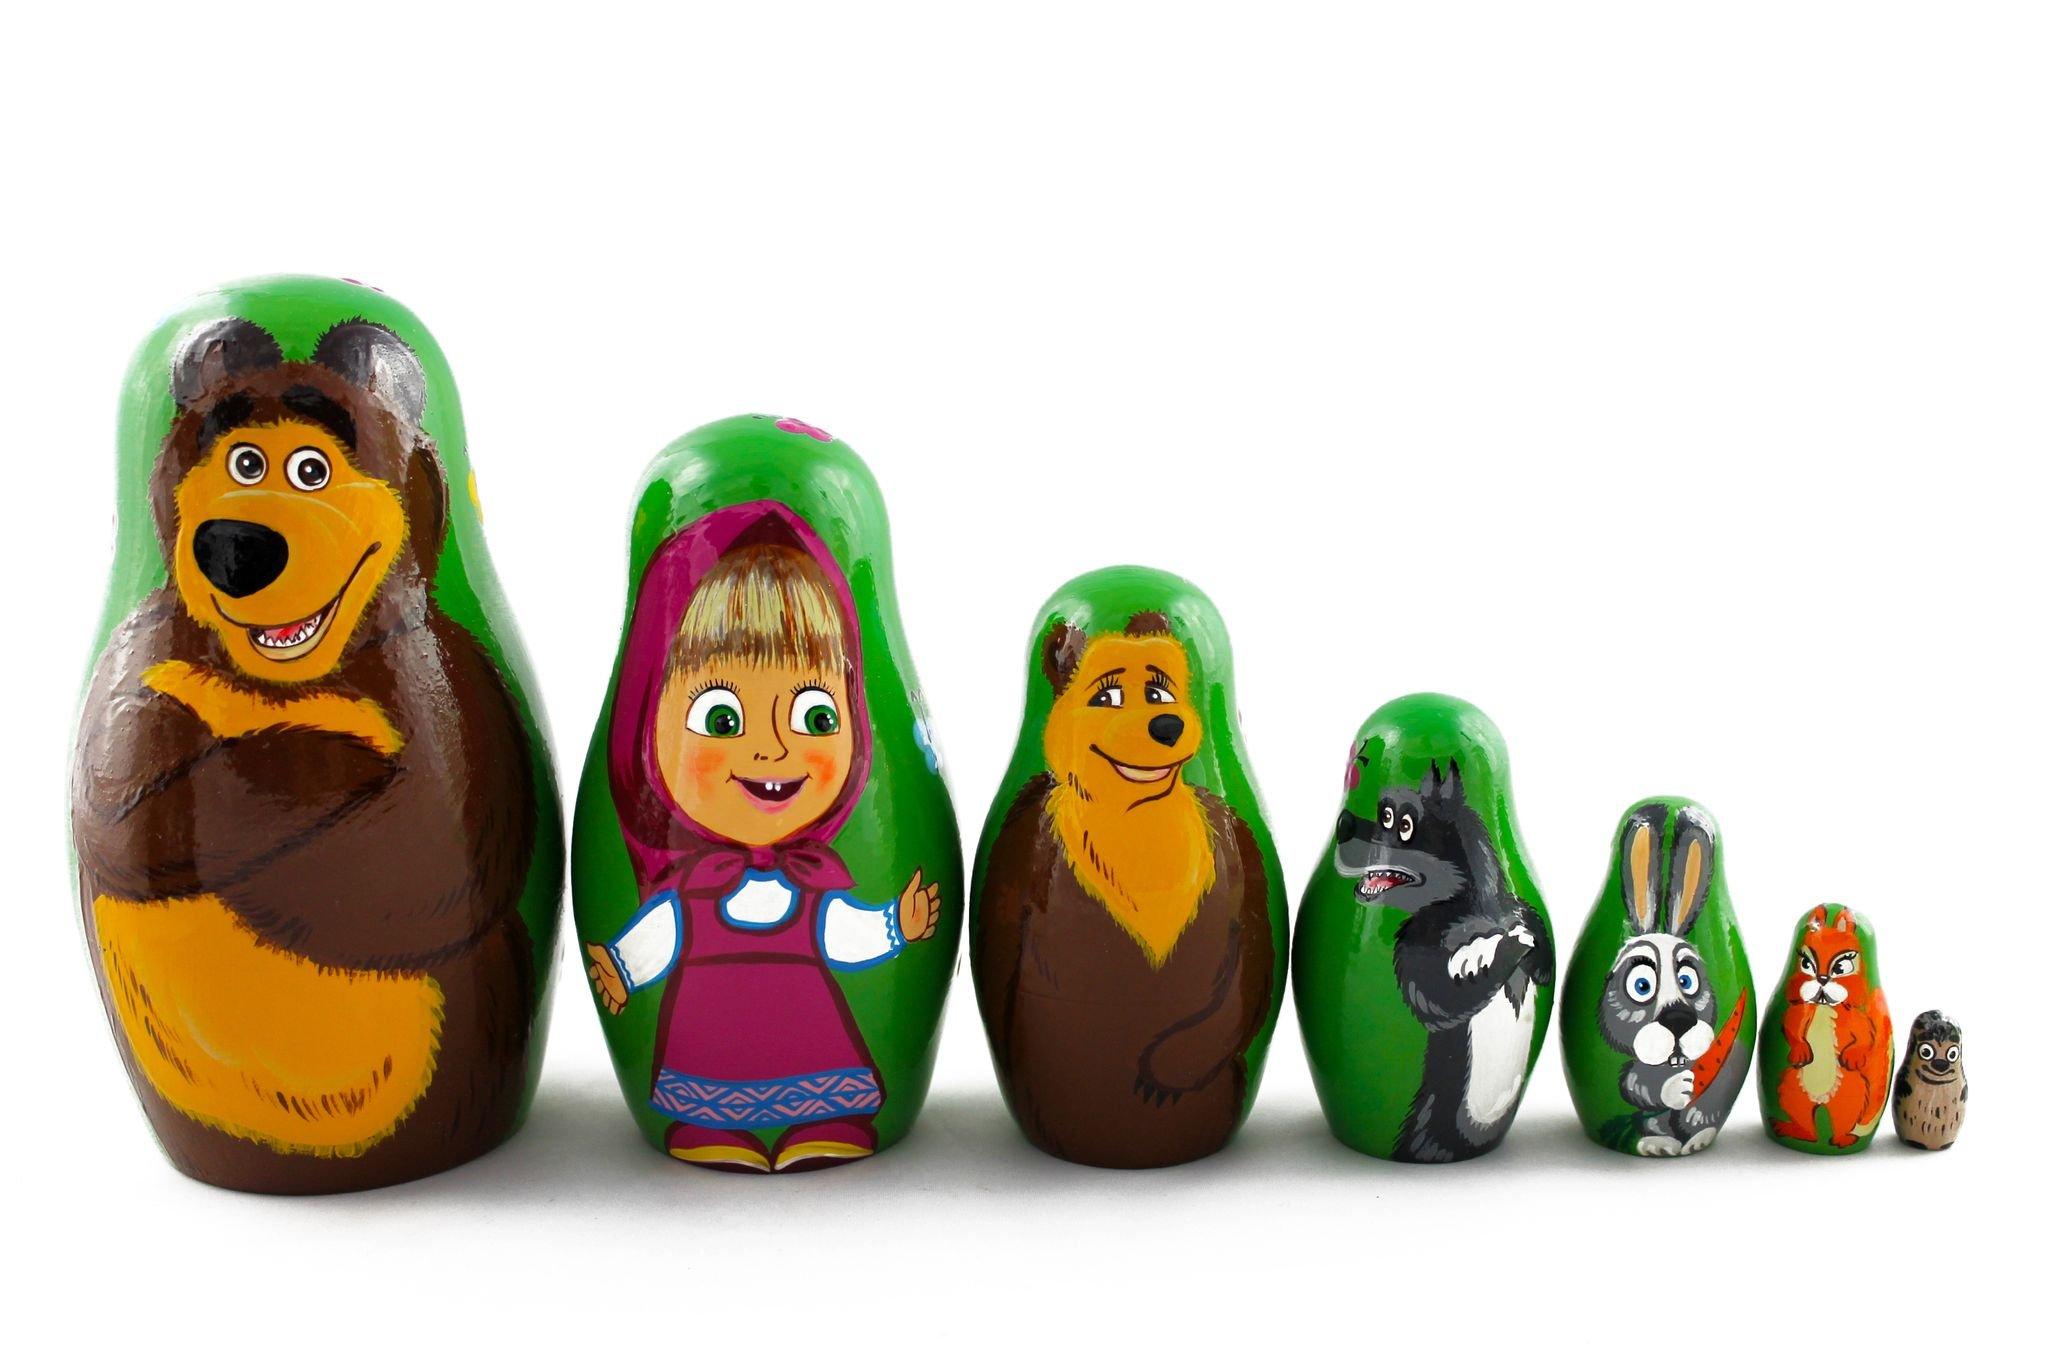 Matryoshka Russian Nesting Wooden Doll Masha and Bear Cartoon 7 Pcs Set Gift Decorative Stacking Hand Painting Beautiful Nested Great Craft by MATRYOSHKA&HANDICRAFT (Image #6)